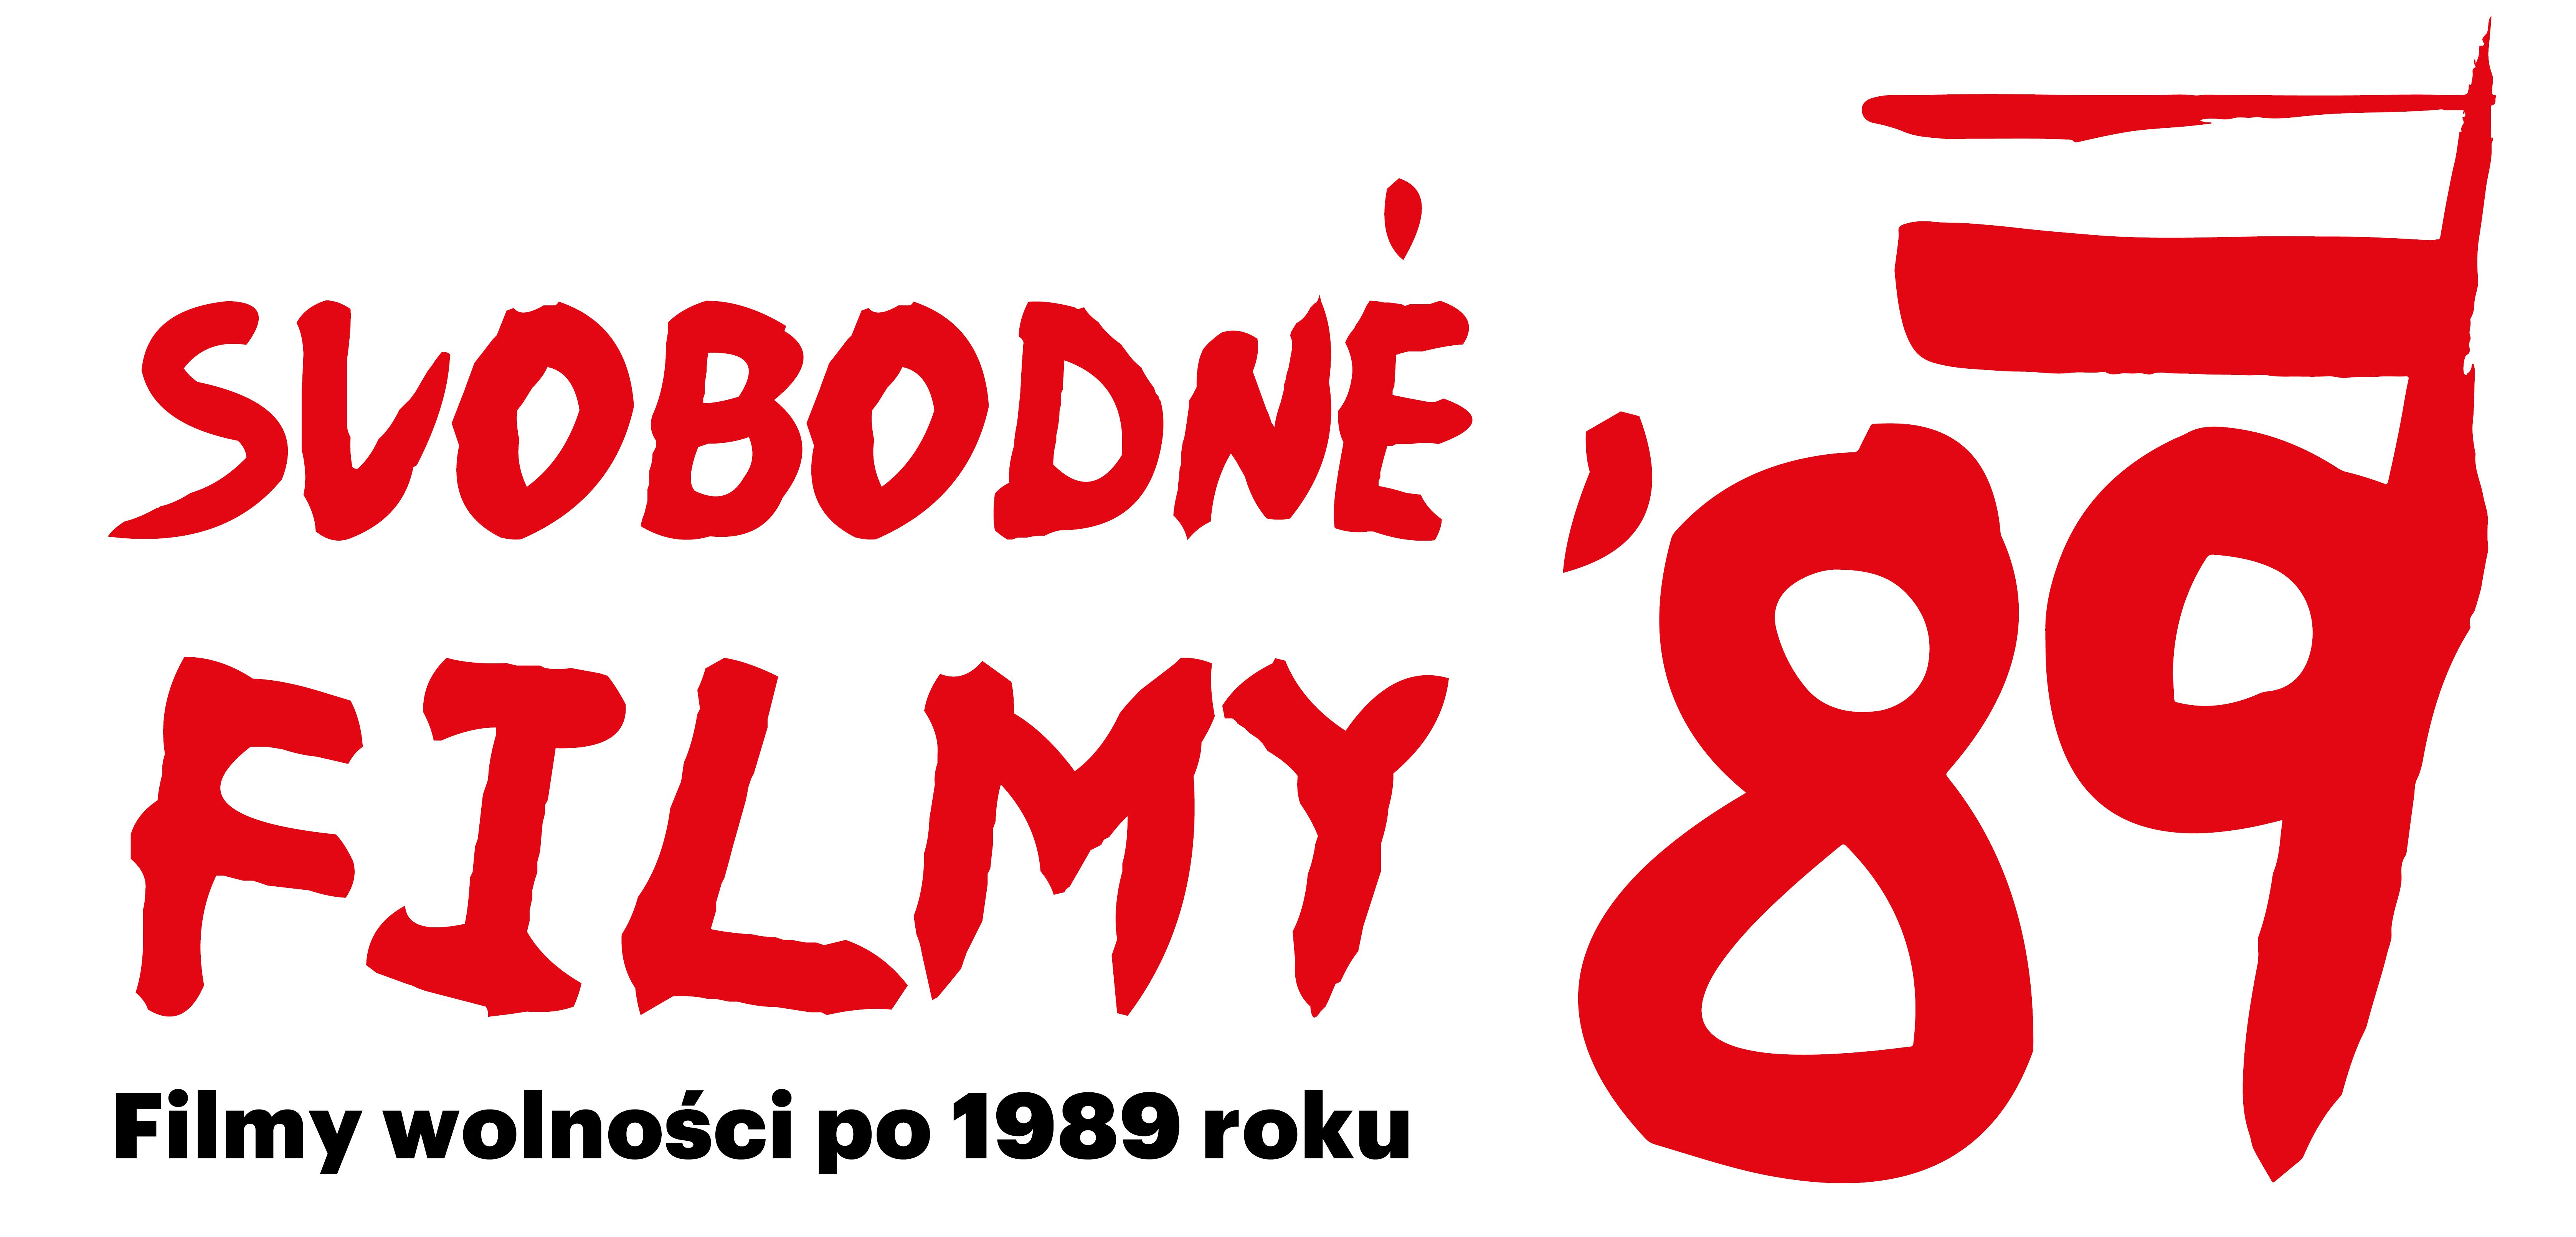 Filmy wolności po 1989 - Svobodná tvorba po roce 1989